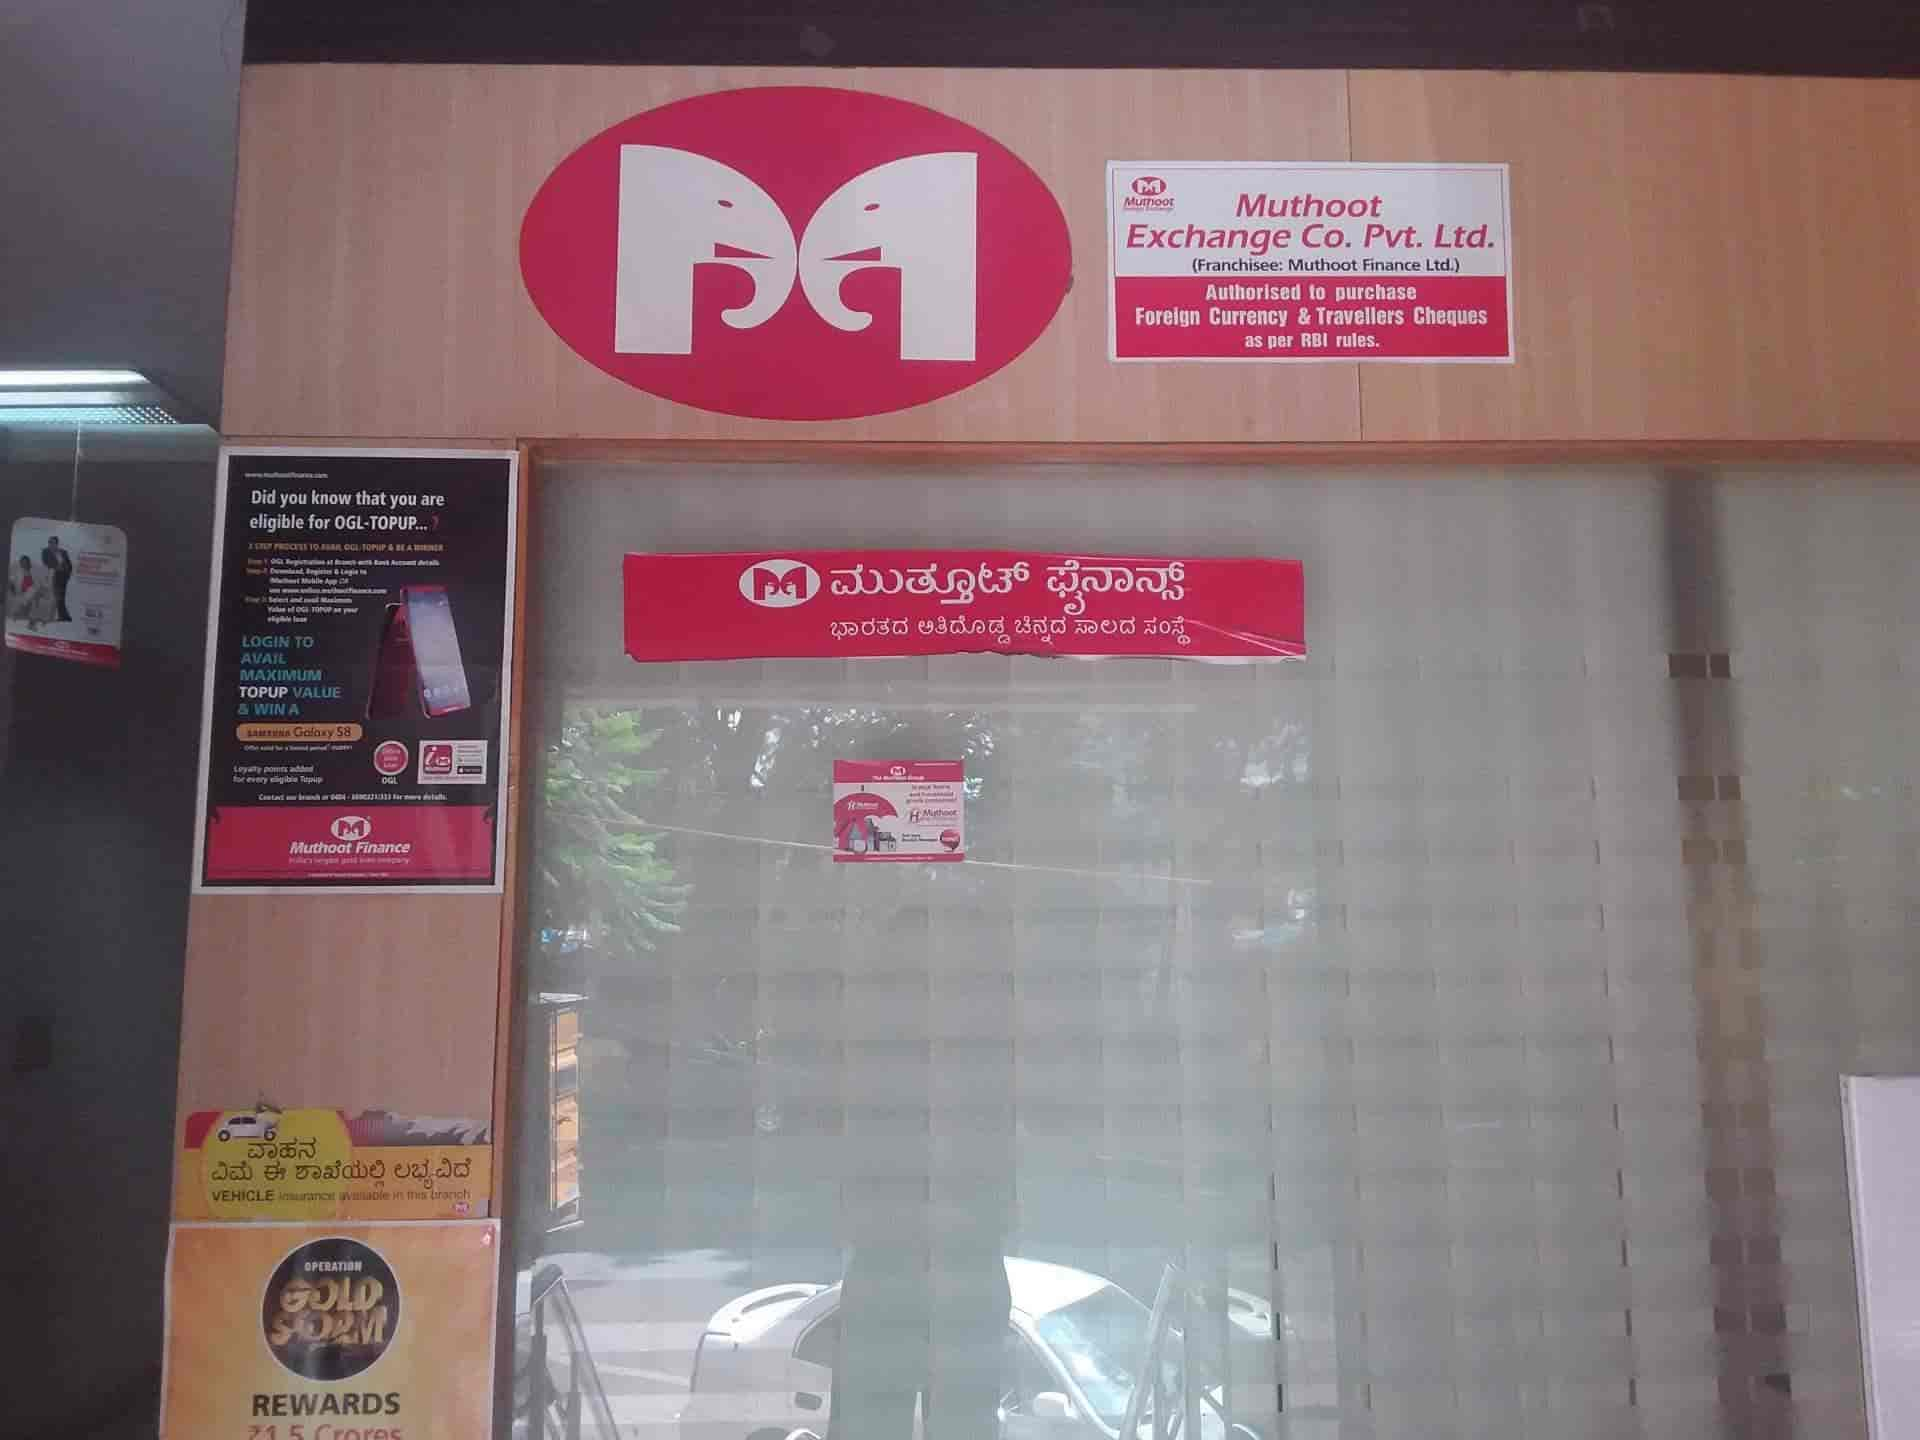 Muthoot Finance Pvt Ltd Photos, Malleswaram, Bangalore- Pictures